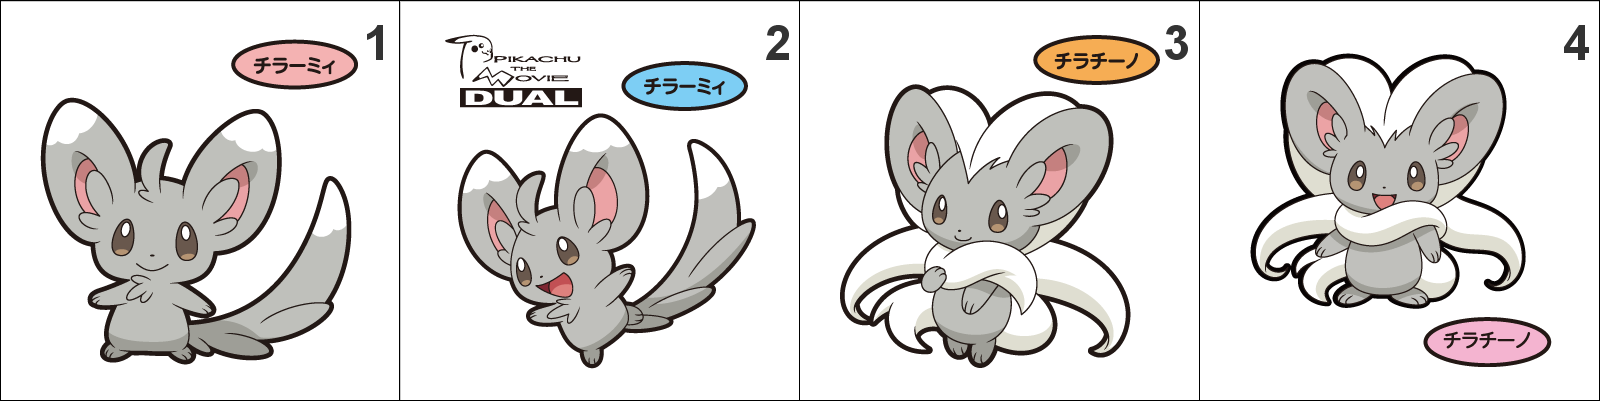 572 573 minccino cinccino pan stickers pokemon splash s pan